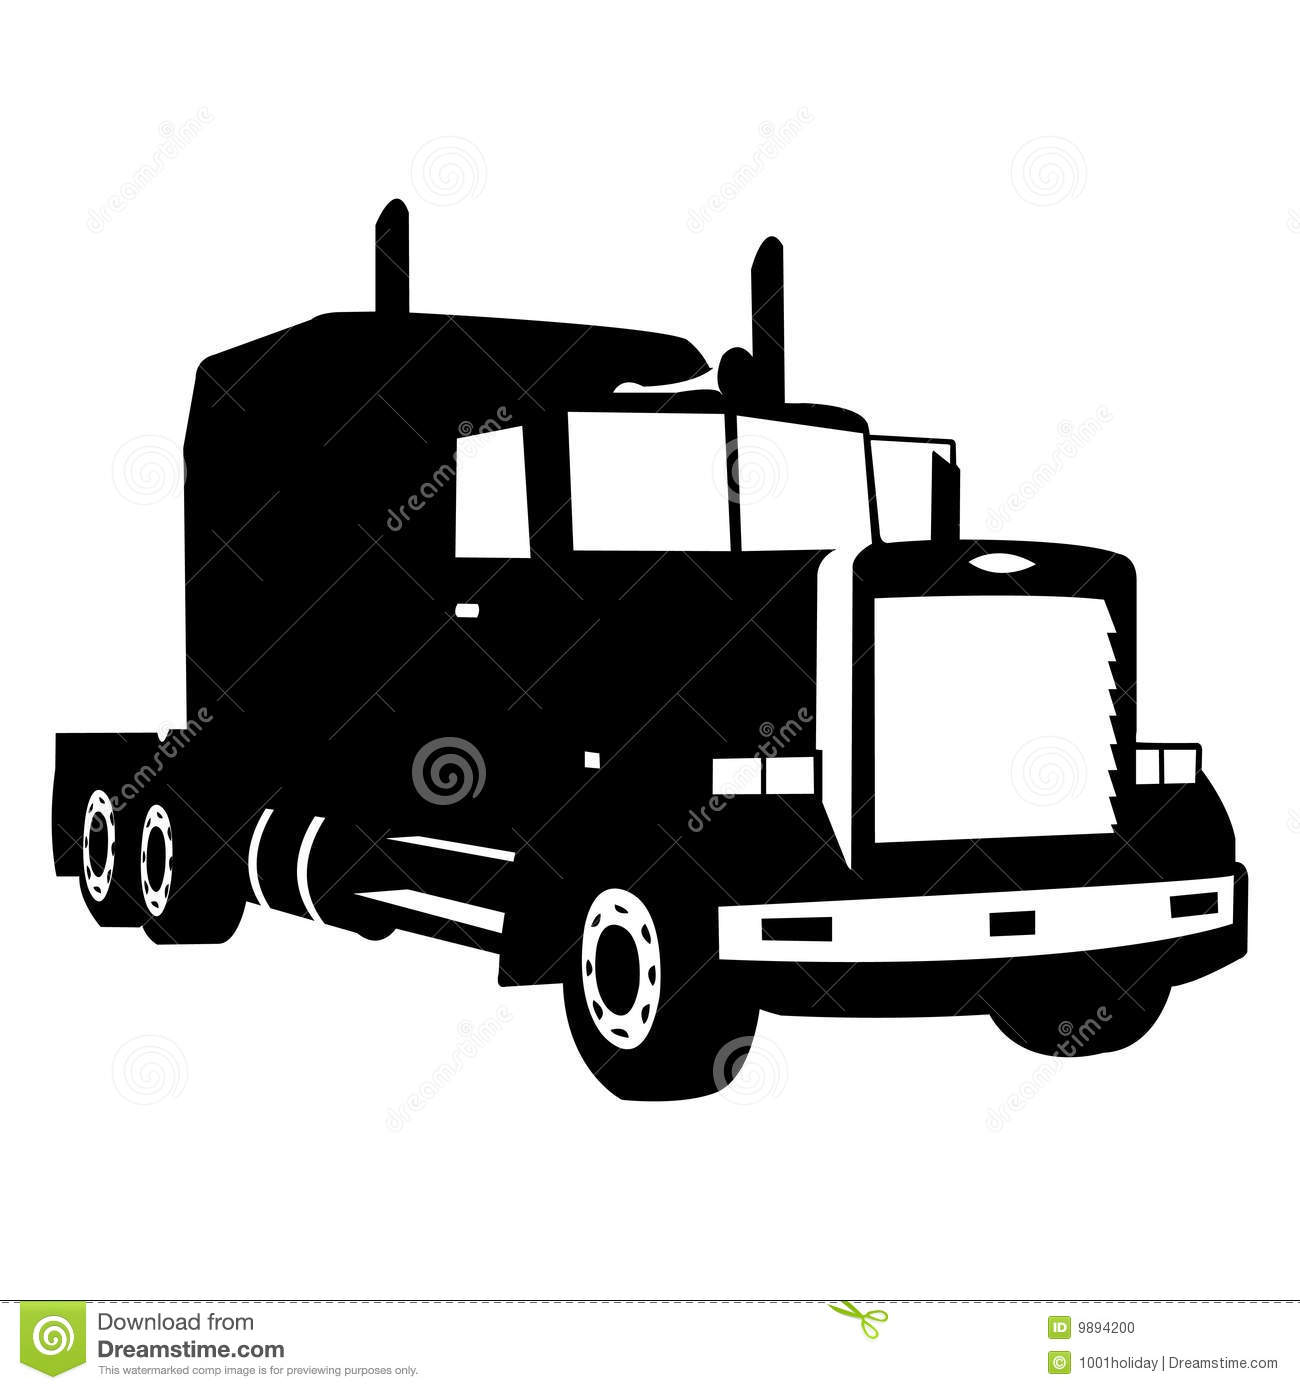 Transfer truck clipart jpg Semi Truck Silhouette Clipart - Clipart Kid jpg